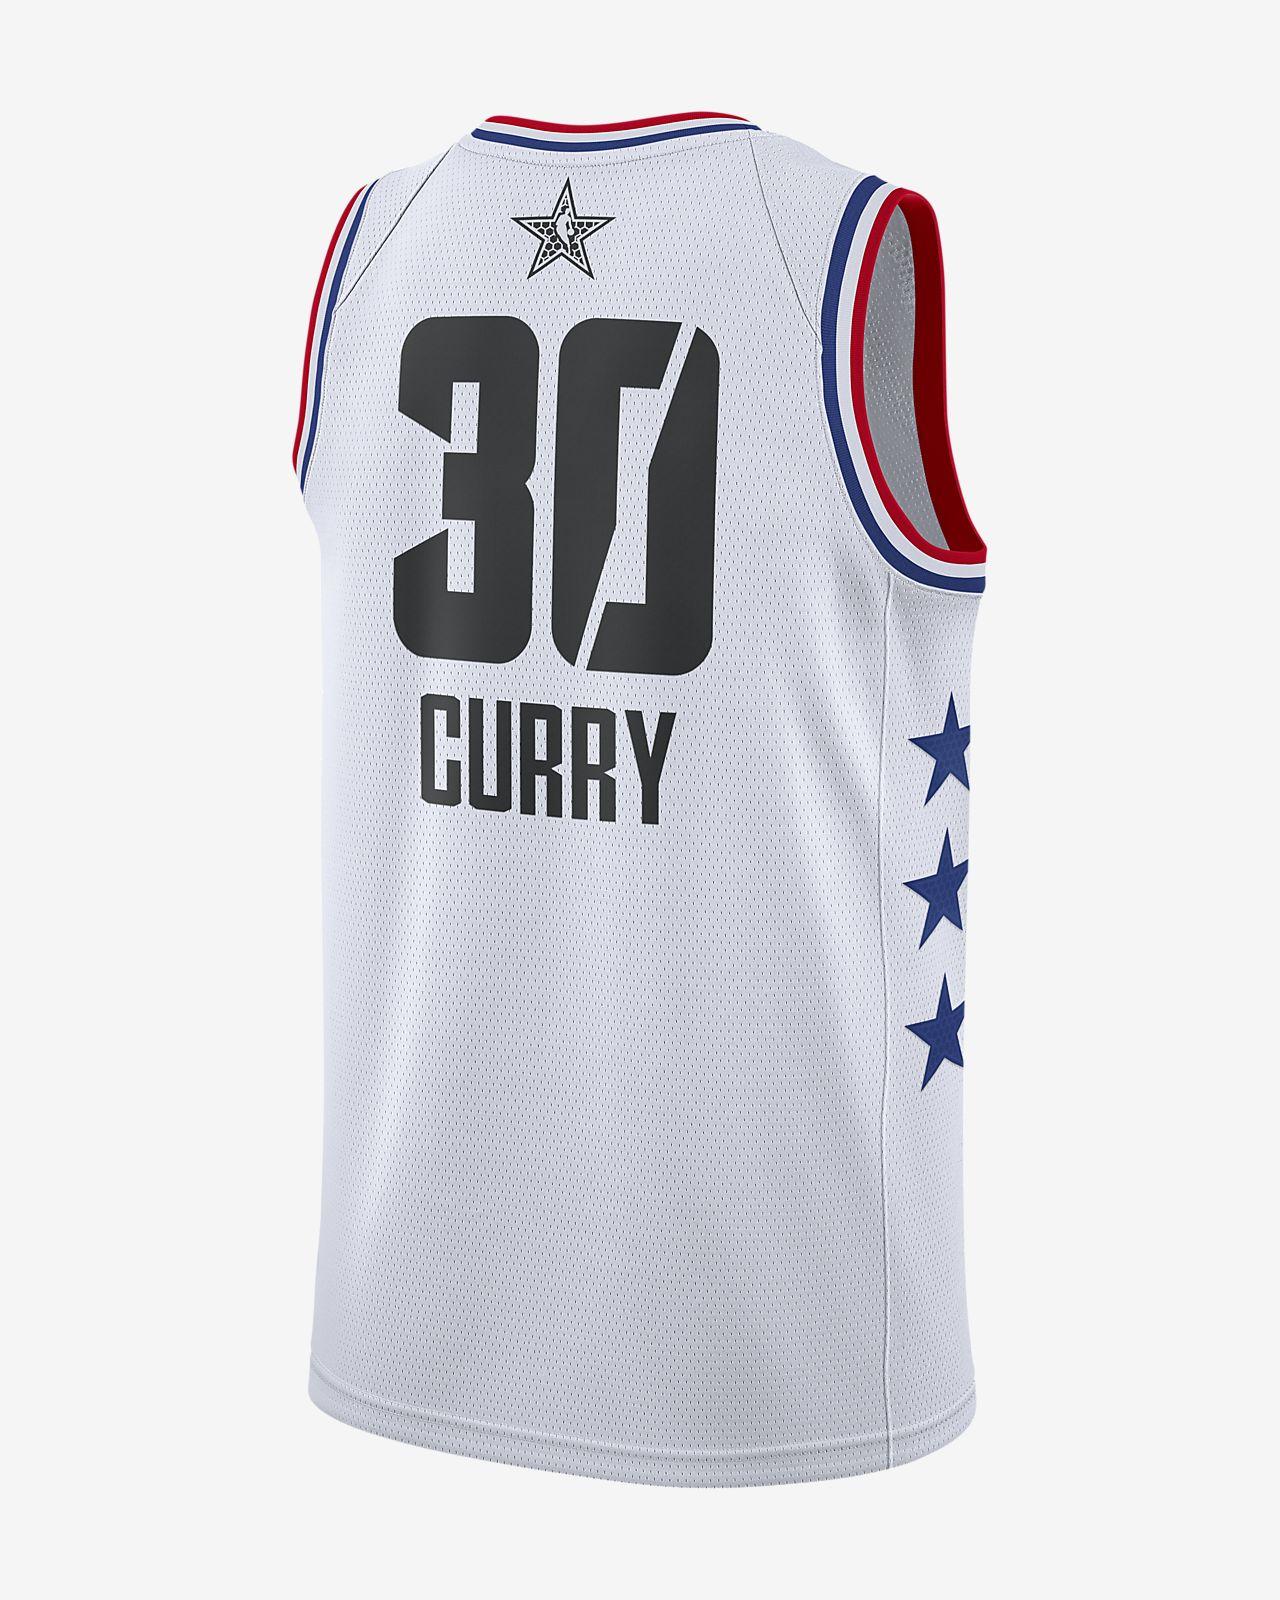 1669335d96f ... Stephen Curry All-Star Edition Swingman Men s Jordan NBA Connected  Jersey